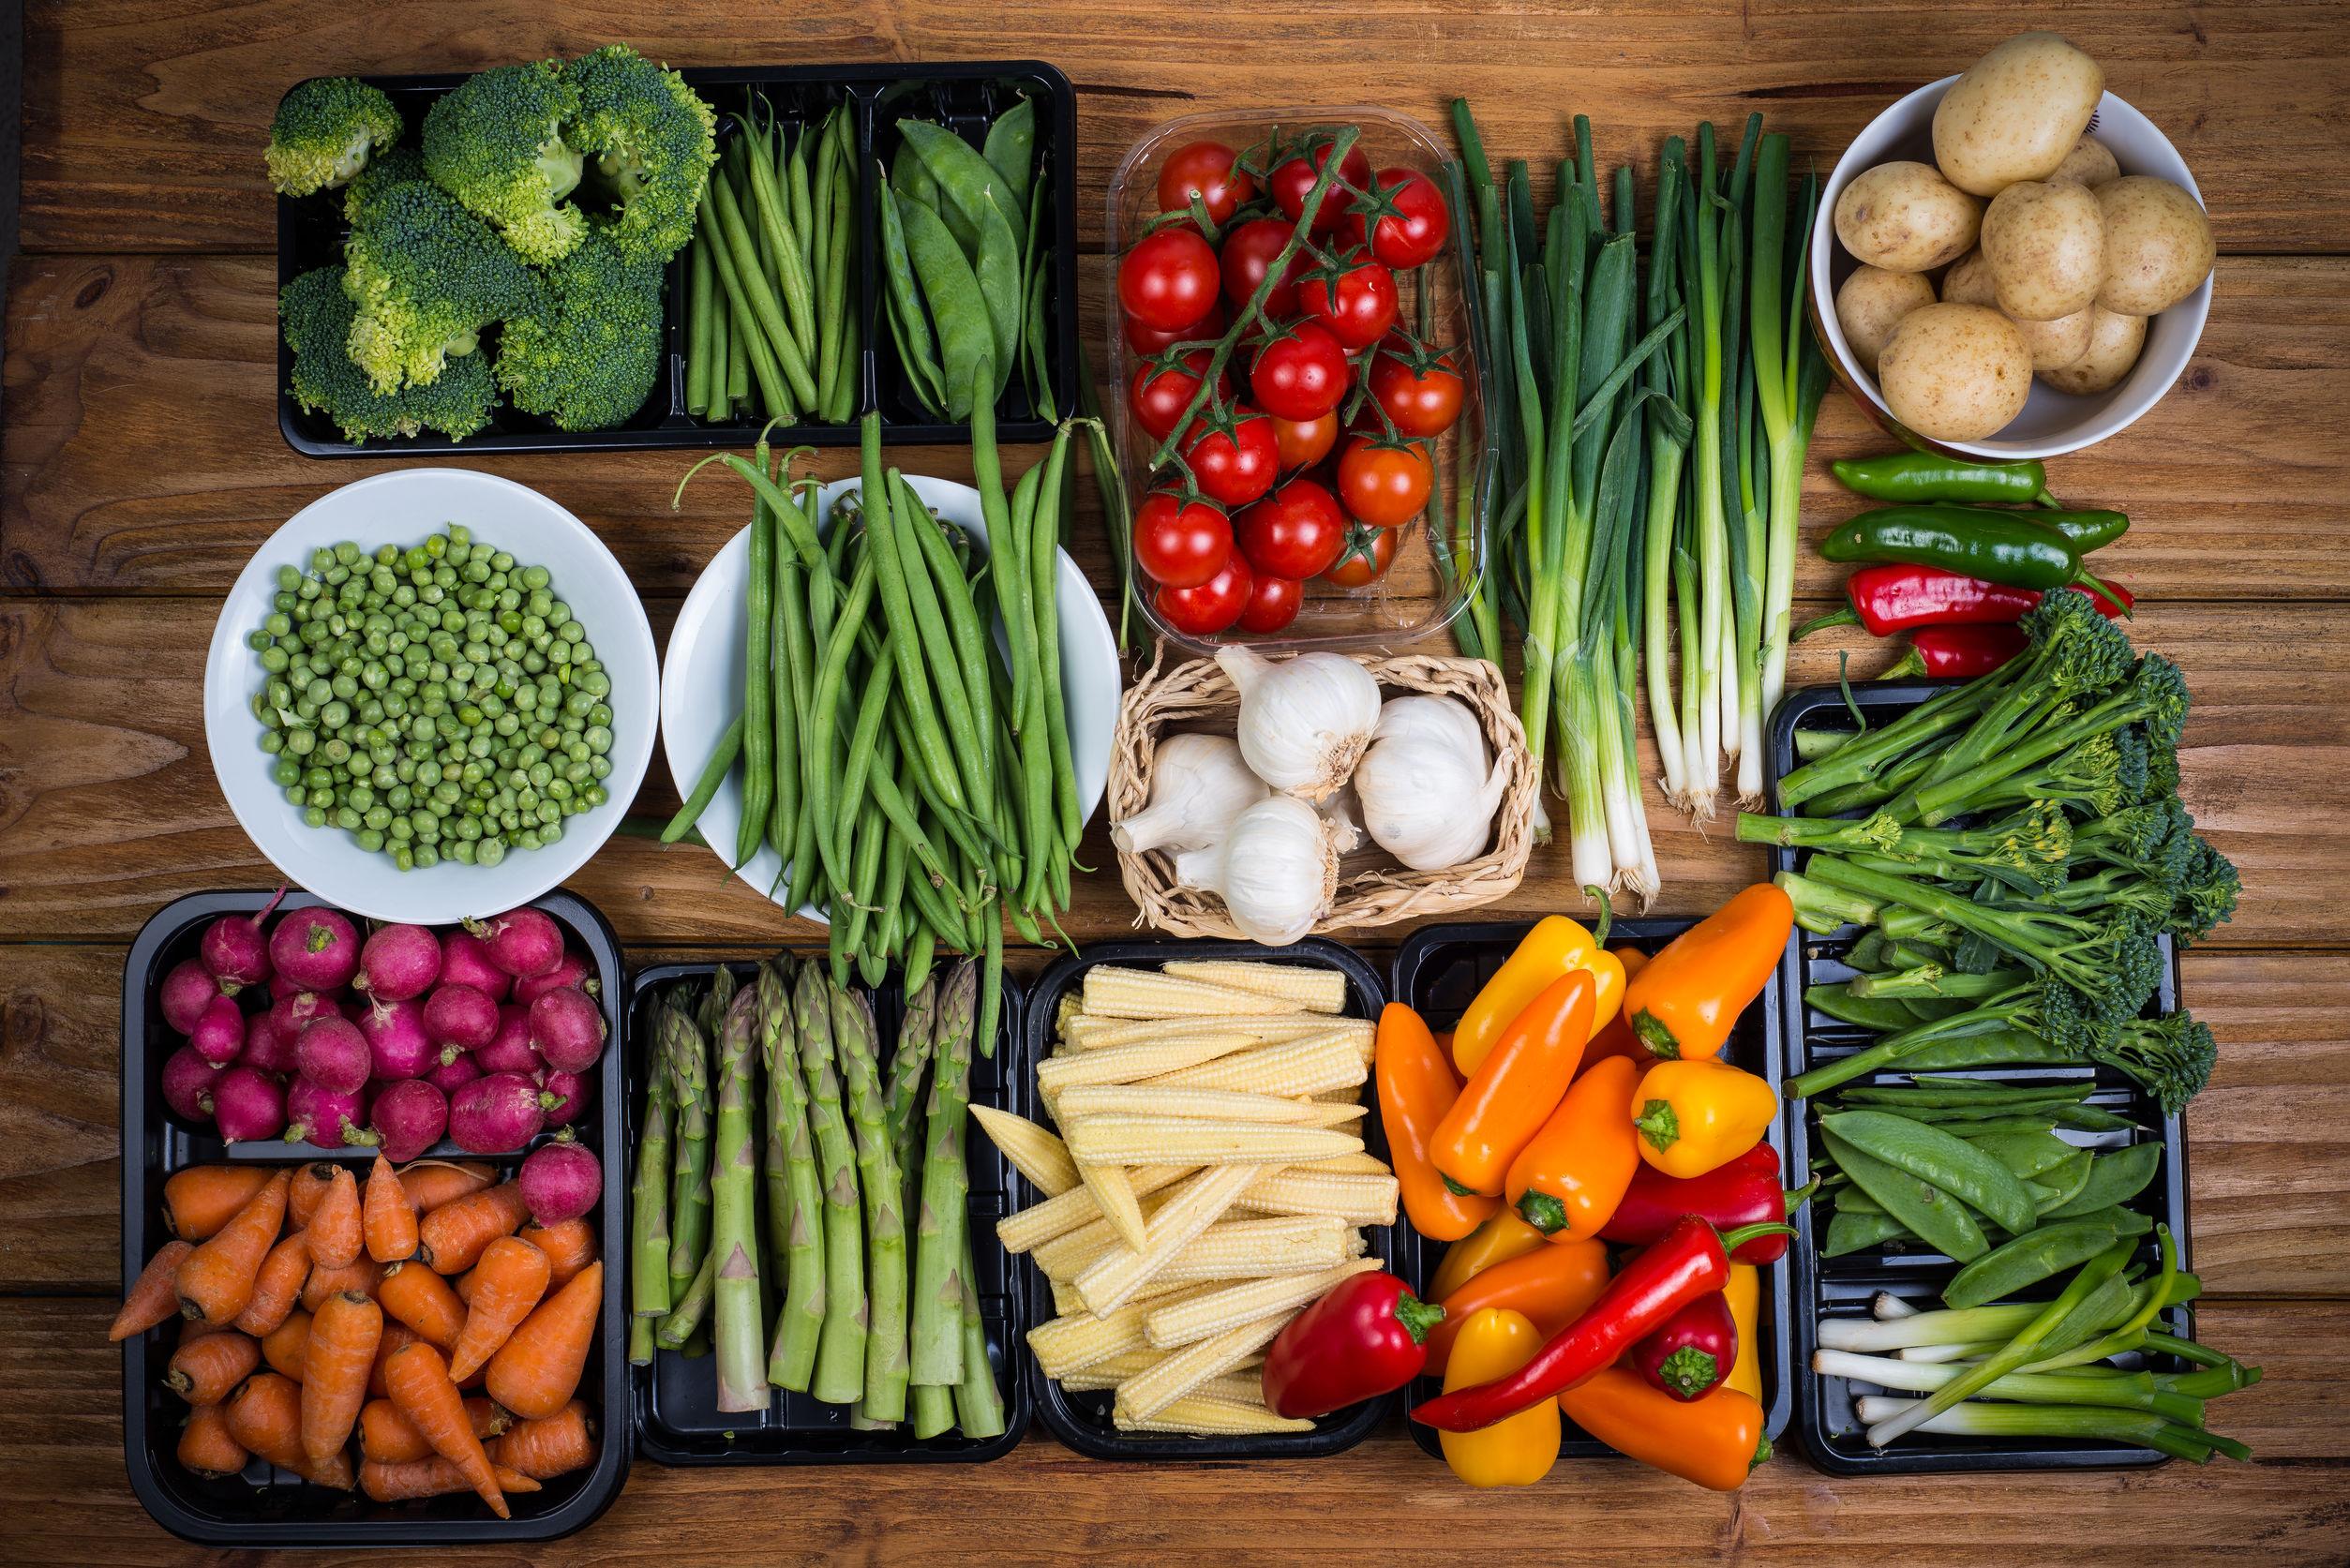 Miben van sok vitamin?